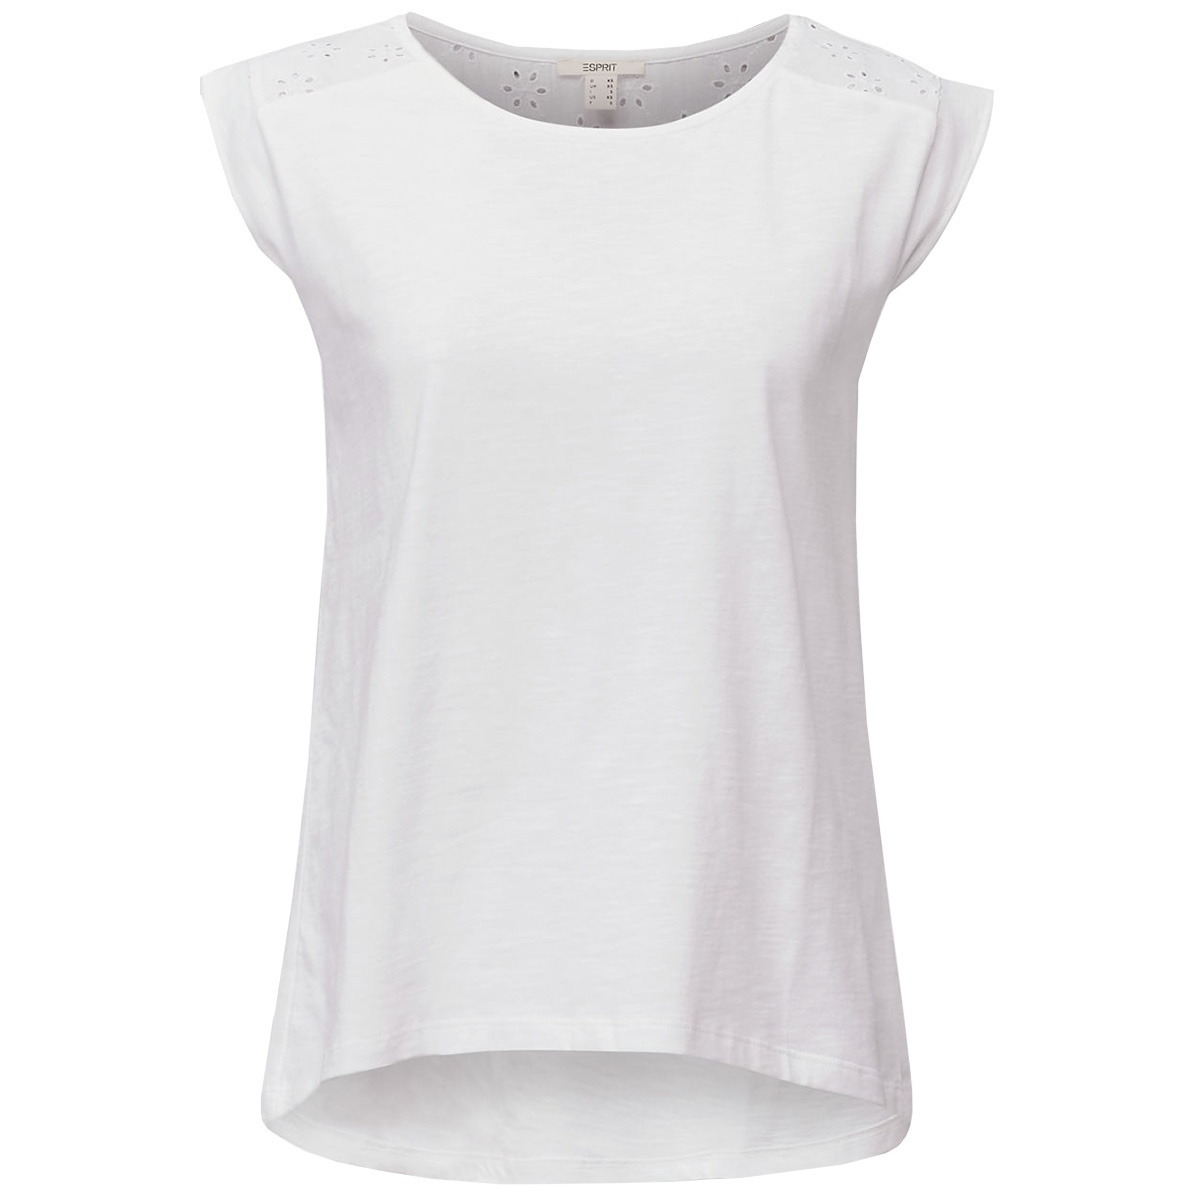 fashion t shirt 030ee1k414 esprit t-shirt e100